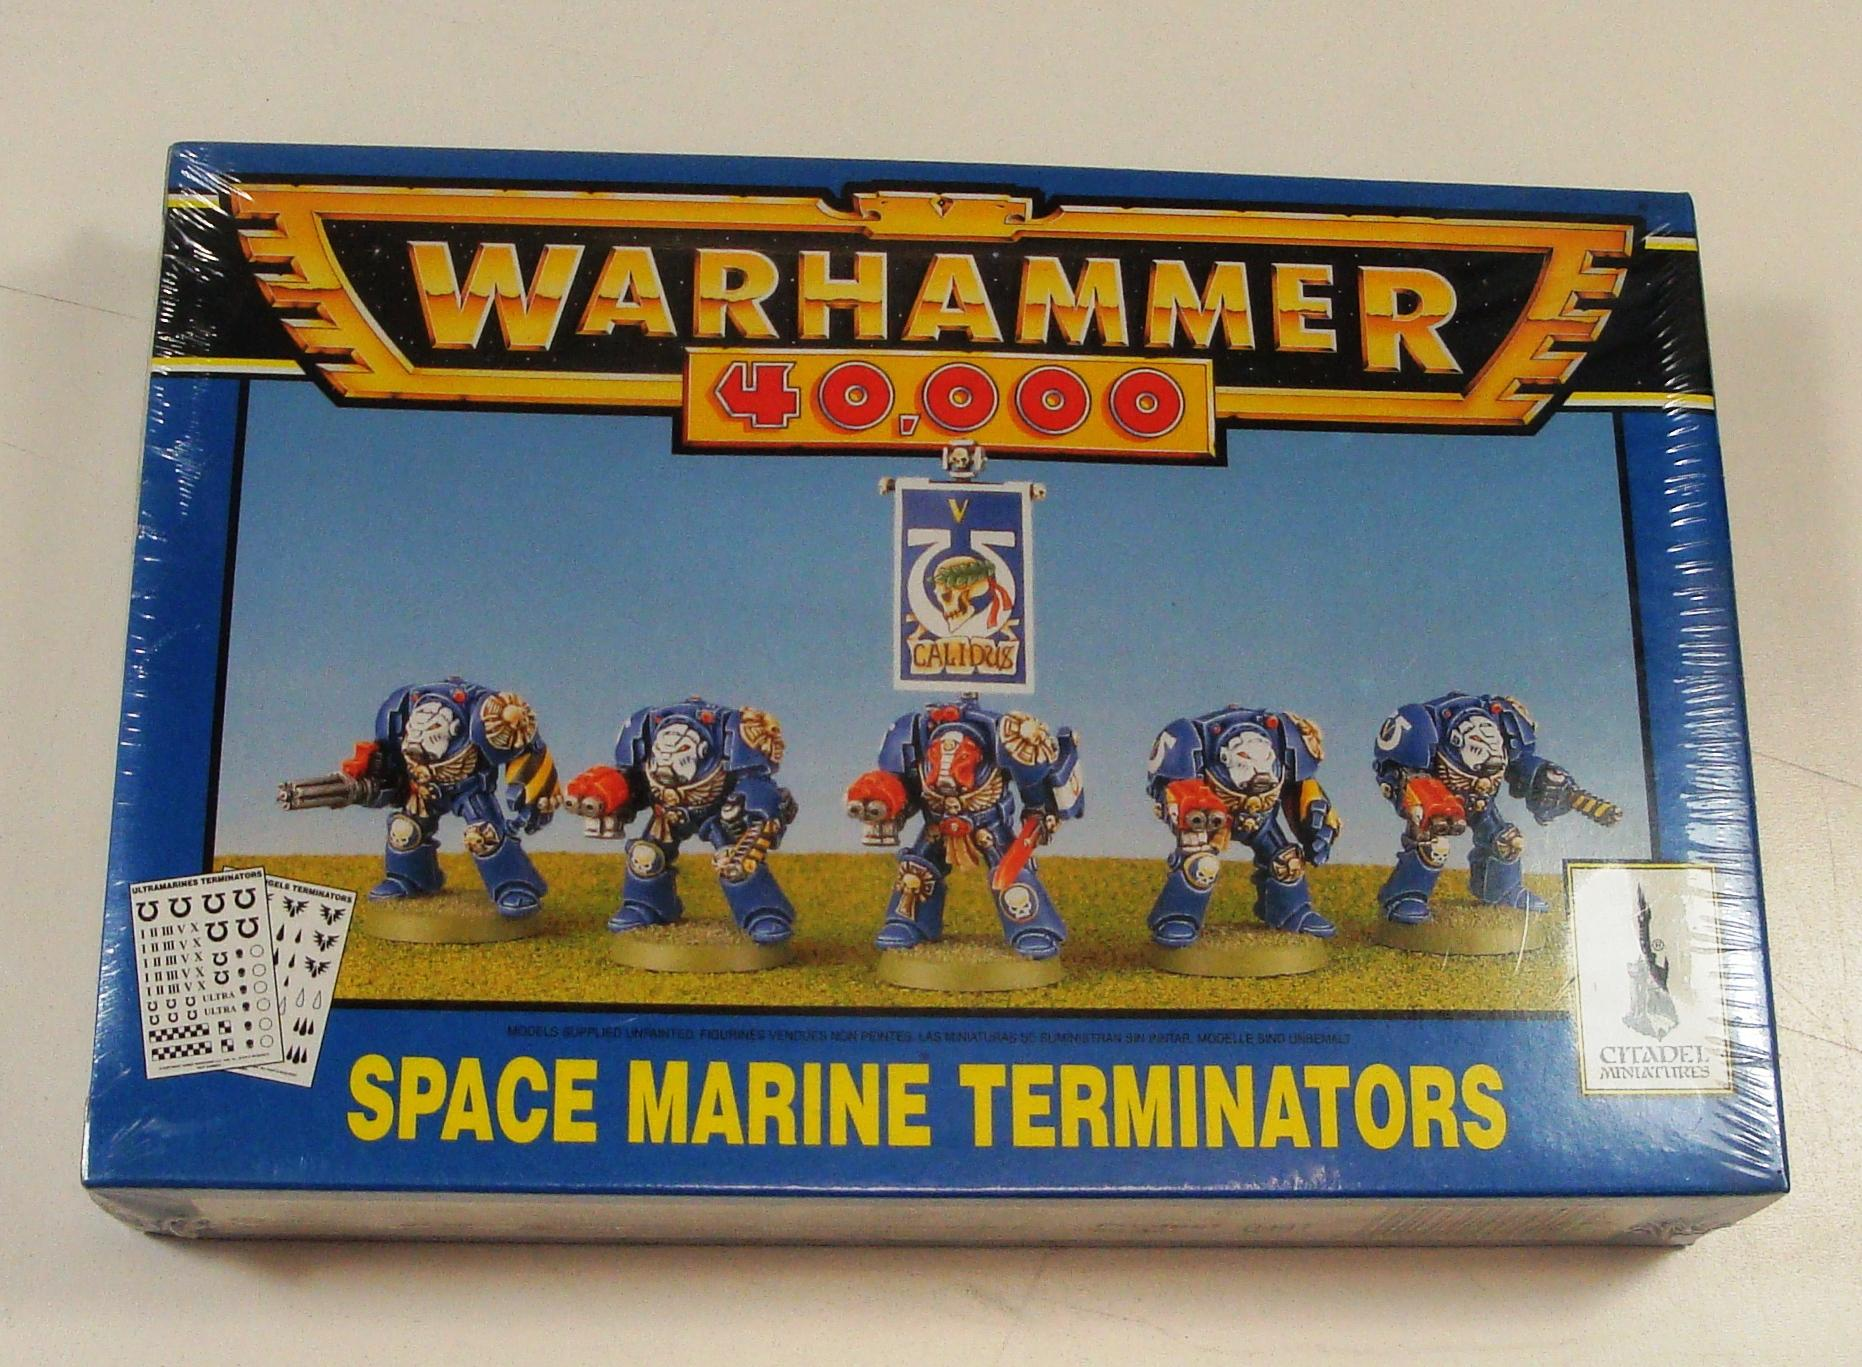 Adeptus Astartes, Astartes, Blood Angels, Dreadnought, Imperial Fists, Predator, Razorback, Rhino, Rogue Trader, Sale, Space Marines, Terminator Armor, Terminator Box, Whirlwind